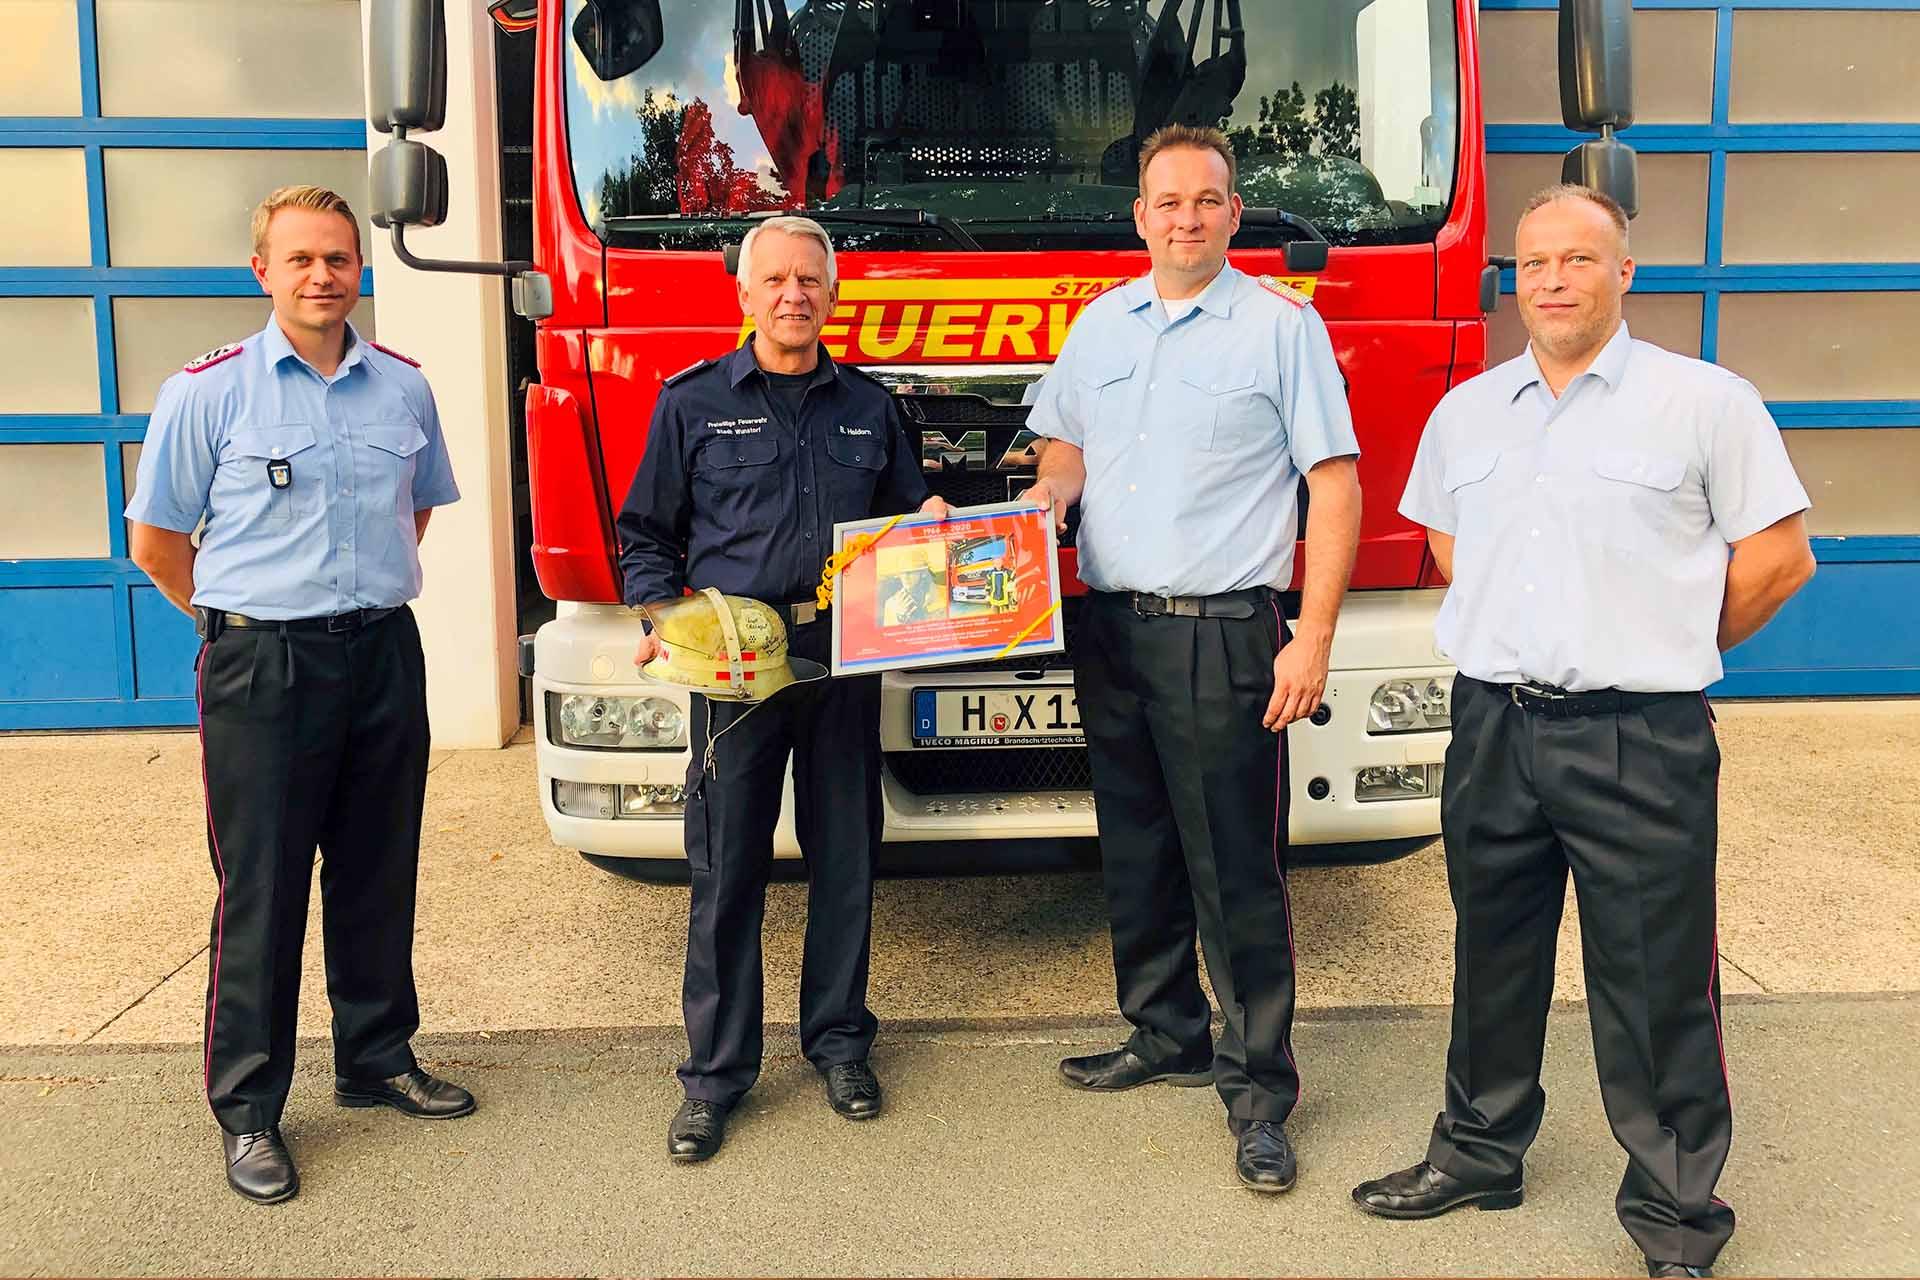 Verabschiedung von Bernd Heidorn in die Feuerwehrrente